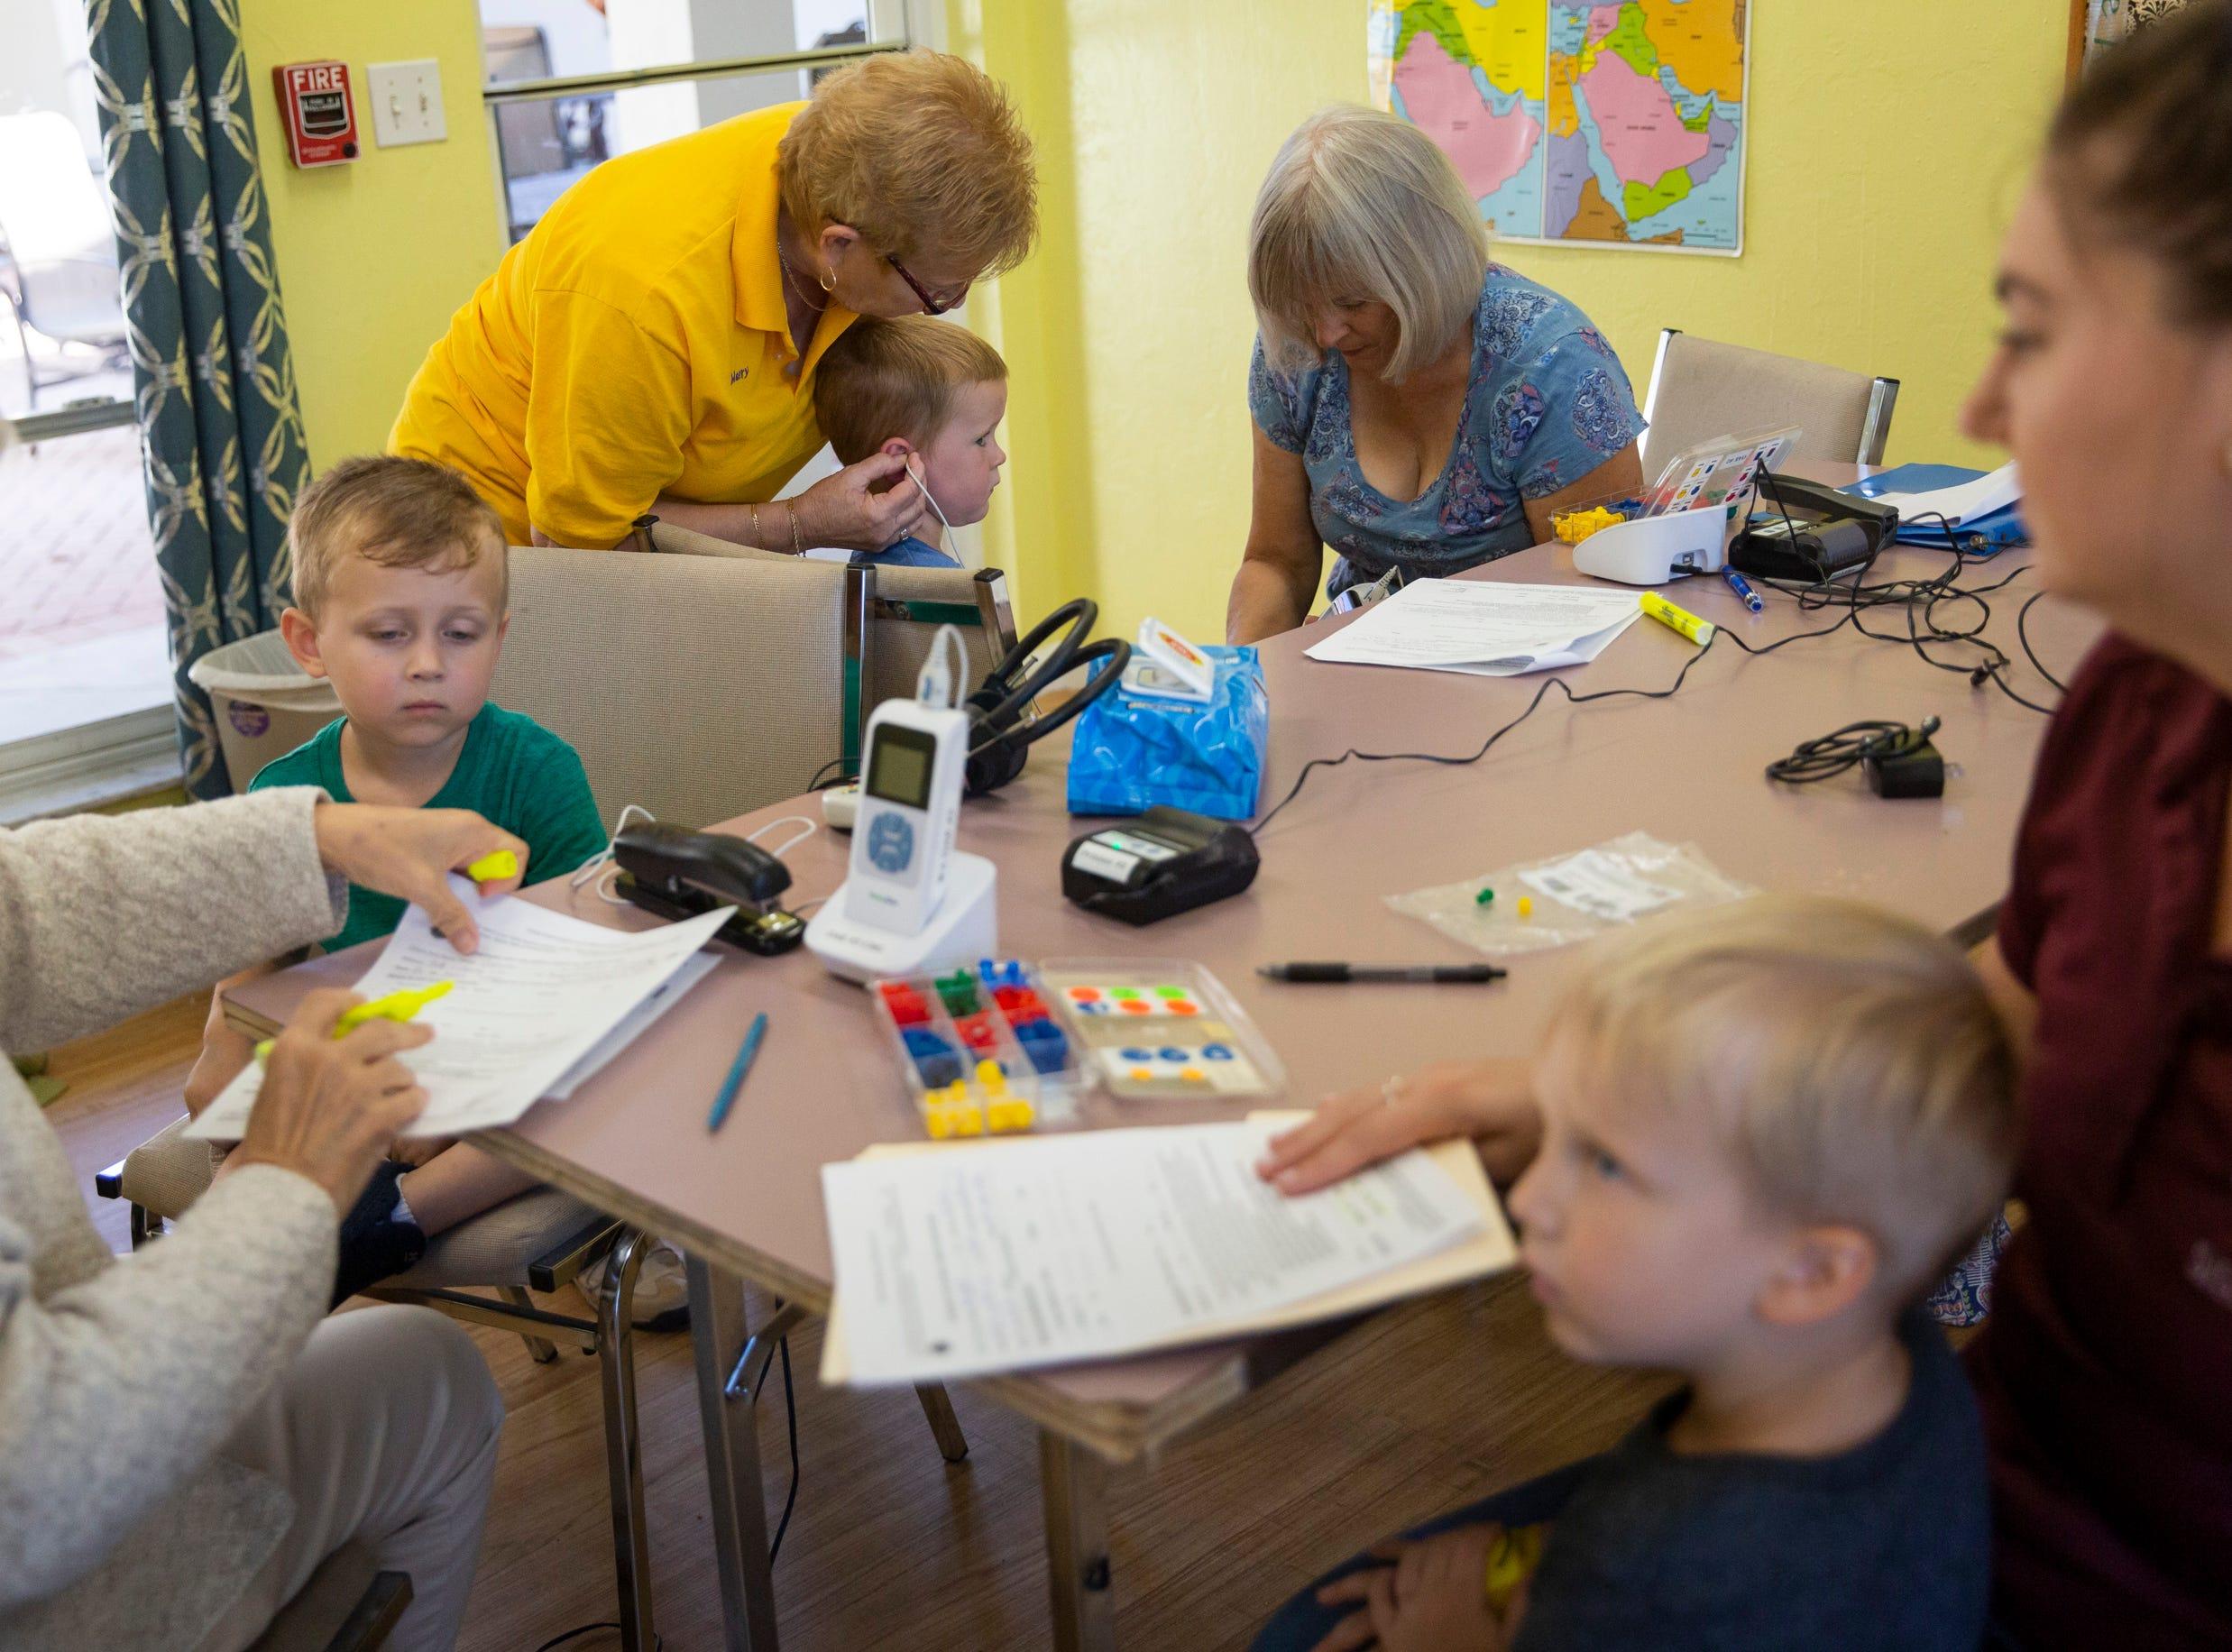 Naples Lions Club volunteers test preschoolers' hearing at Grace Lutheran Preschool in Naples on Friday, April 12, 2019.